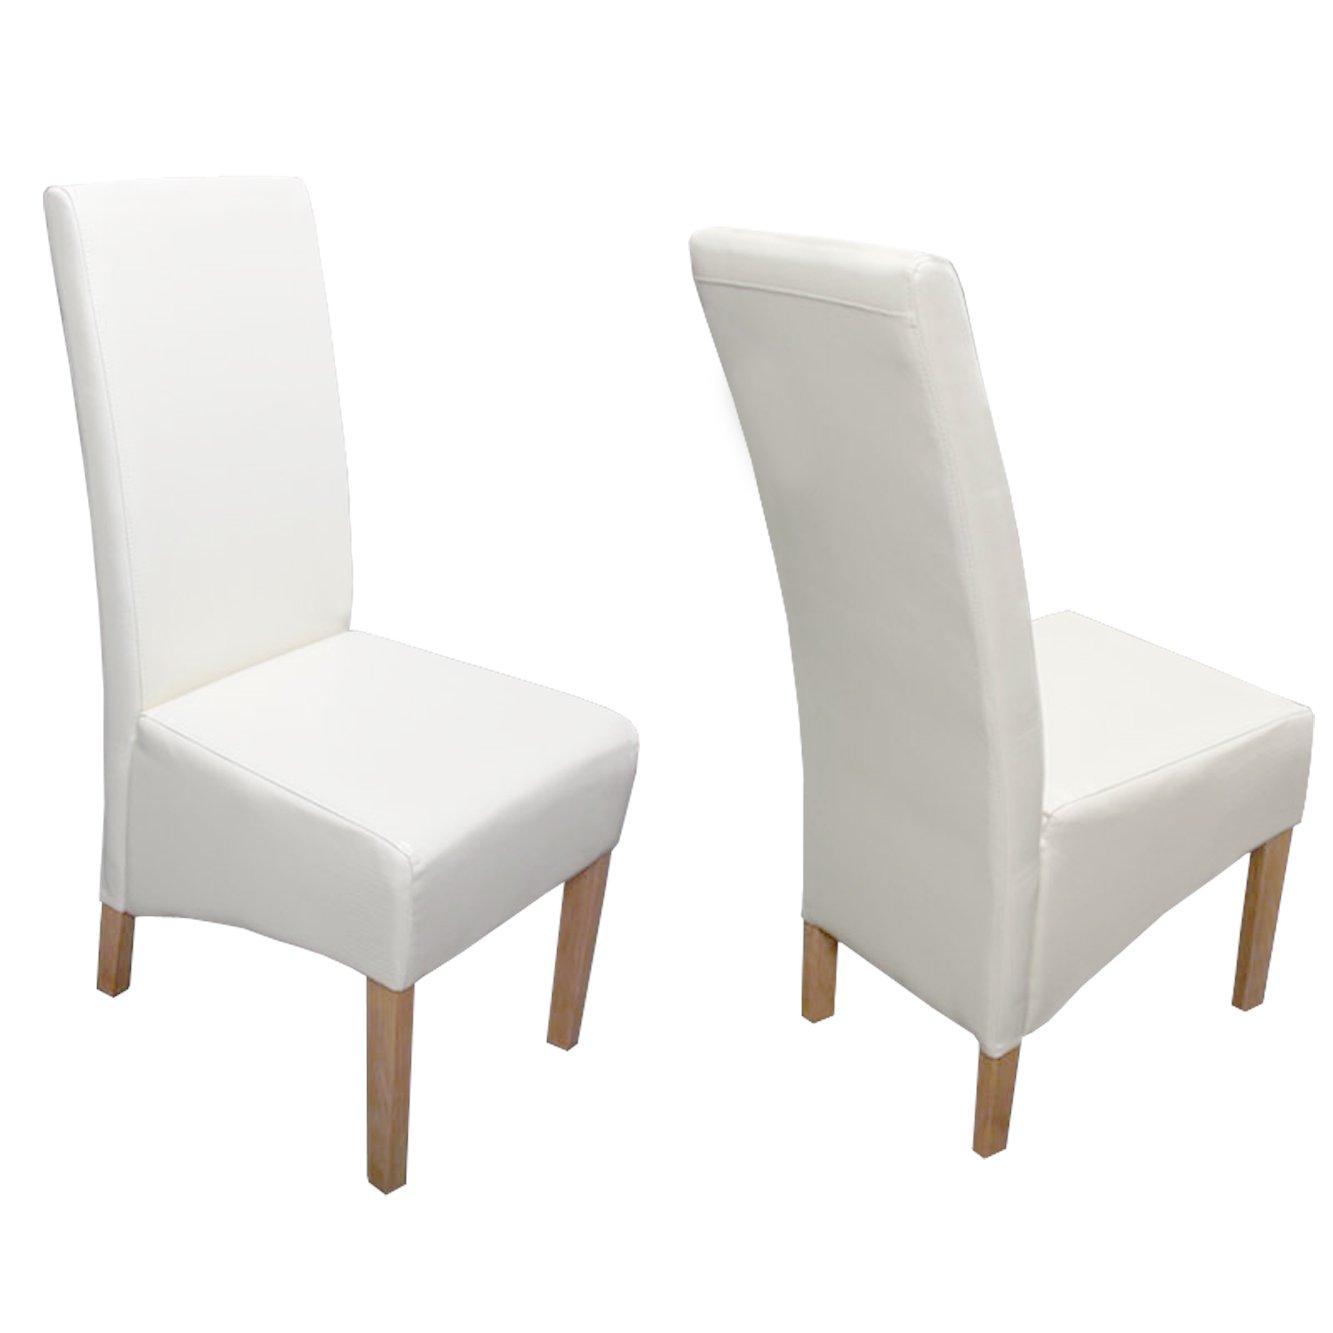 Lote 6 sillas de comedor siena ii en piel beige lote 6 for Sillas comedor polipiel beige